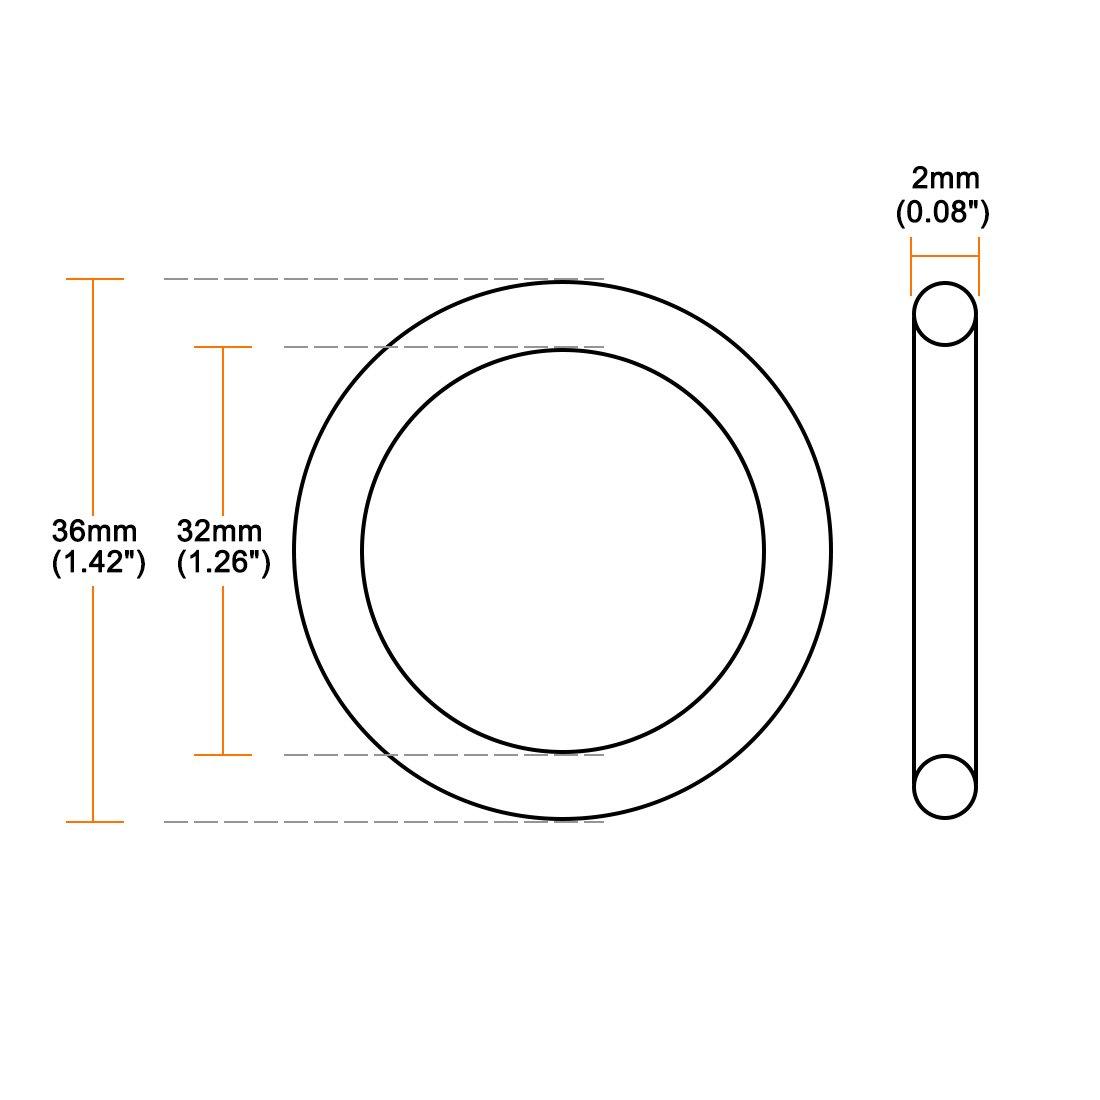 uxcell O-Ringe Nitril Gummi 32/mm-44/mm OD 2/mm dick Dichtung Ringe Dichtungsband Dichtungen 32mmx36mmx2mm